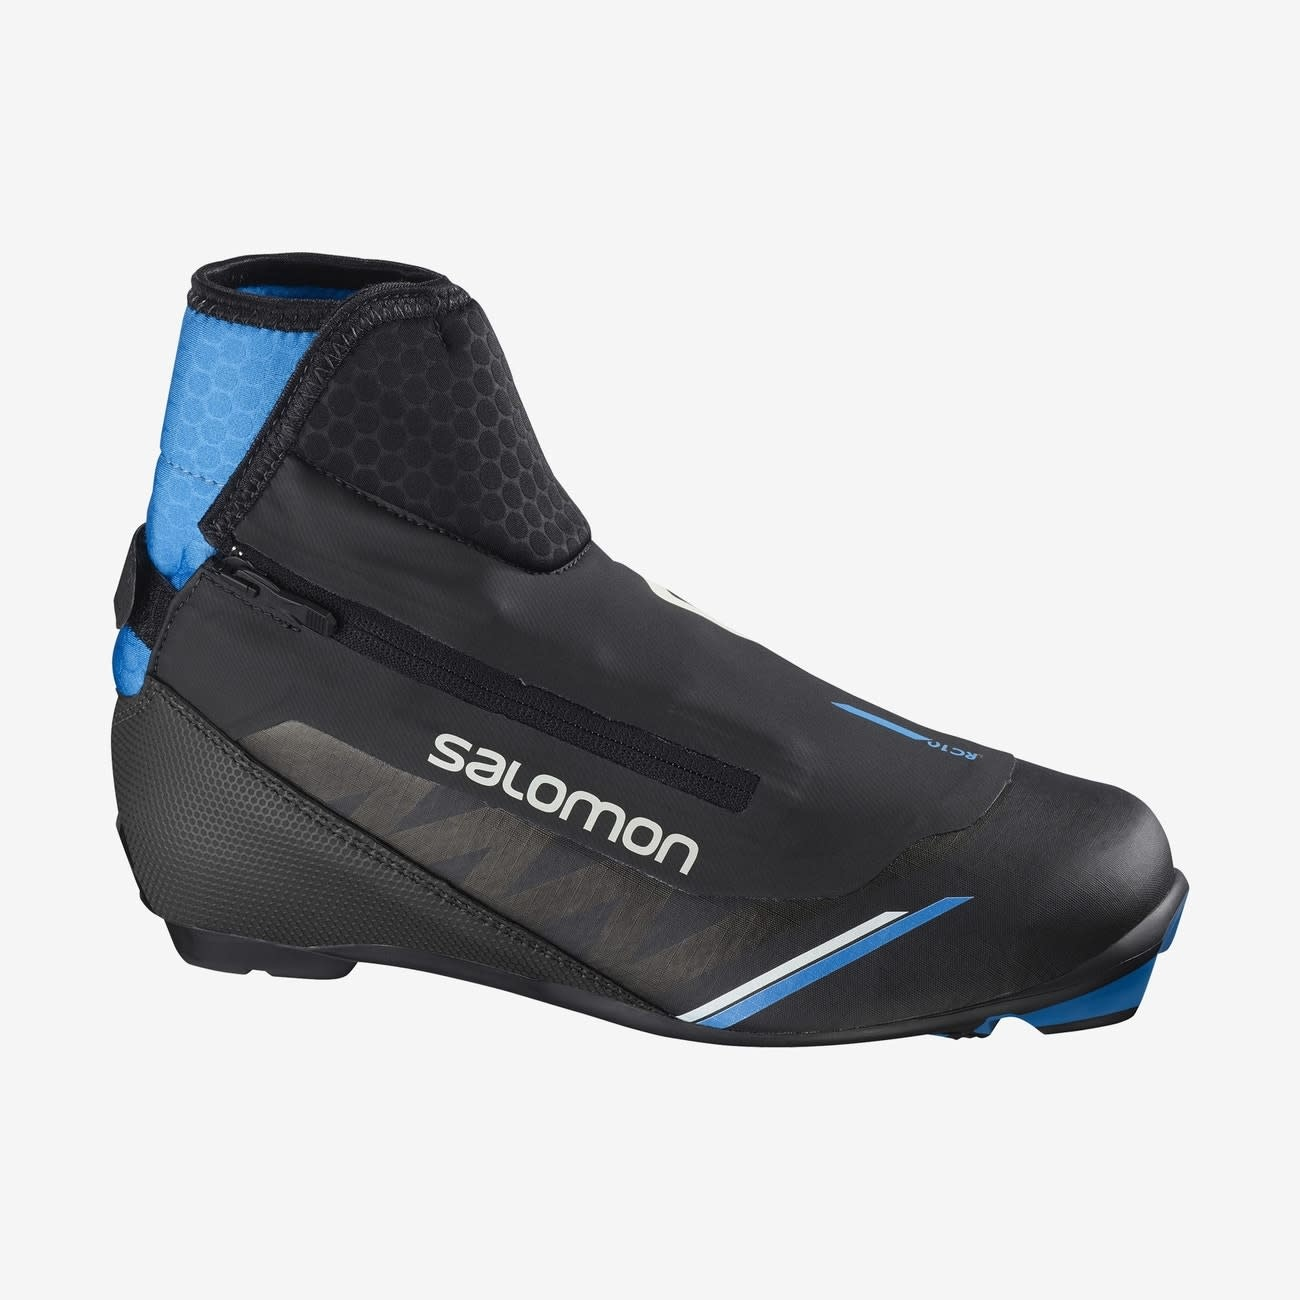 Botte Salomon RC 10 Nocturne Prolink 2022